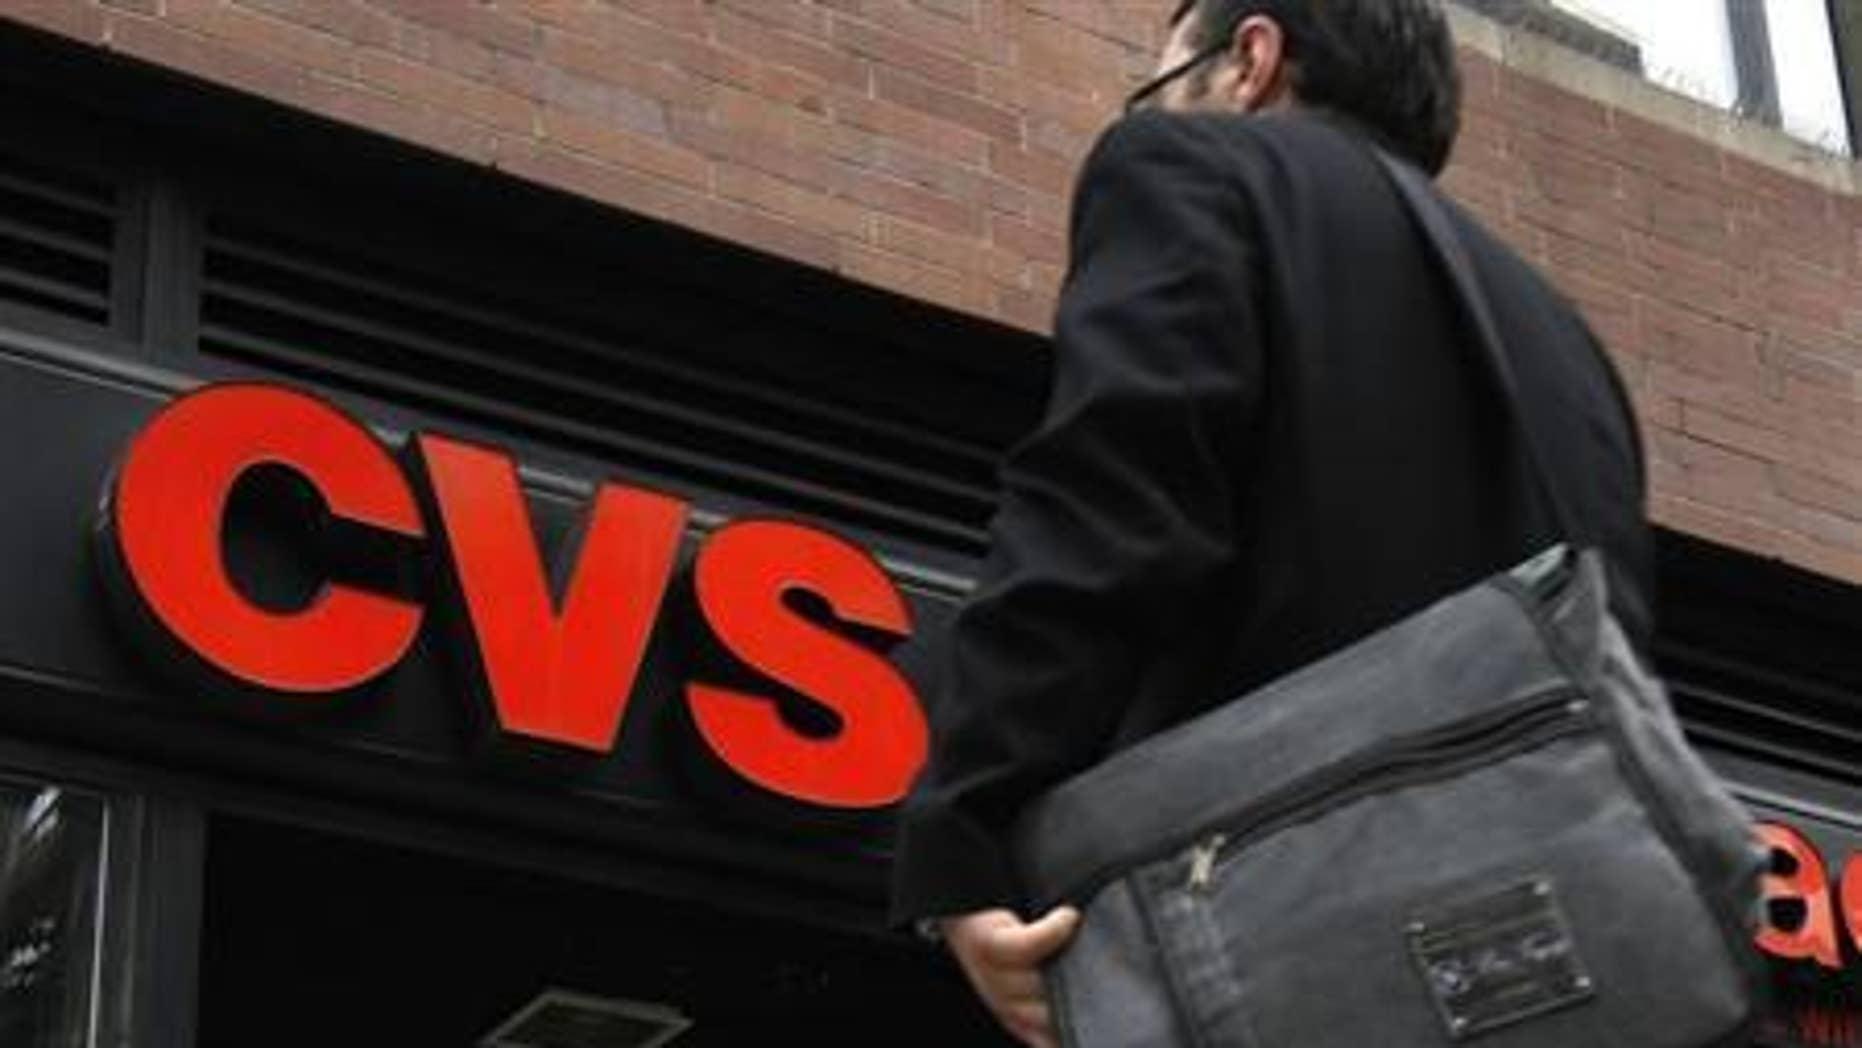 A man walks outside CVS pharmacy in New York City July 28, 2010. REUTERS/Mike Segar